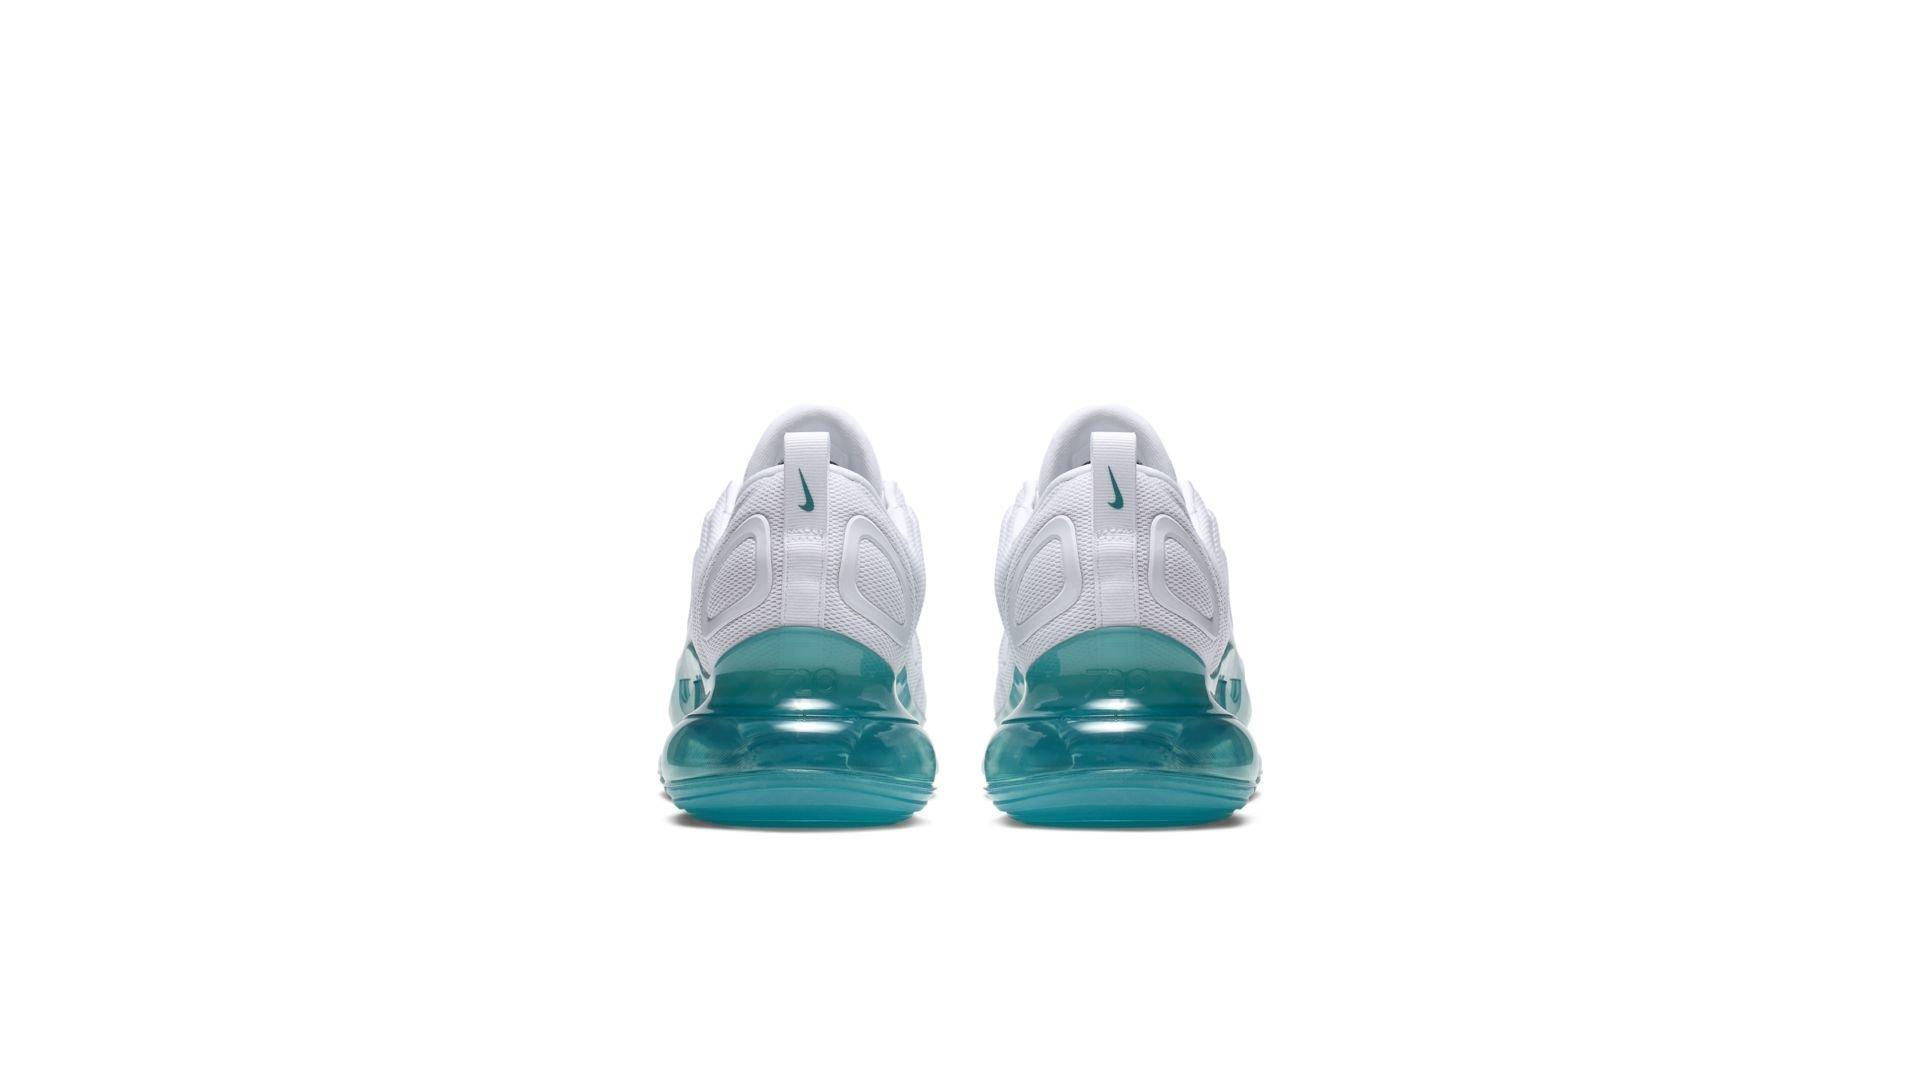 Nike Air Max 720 'Teal' (AO2924-103)